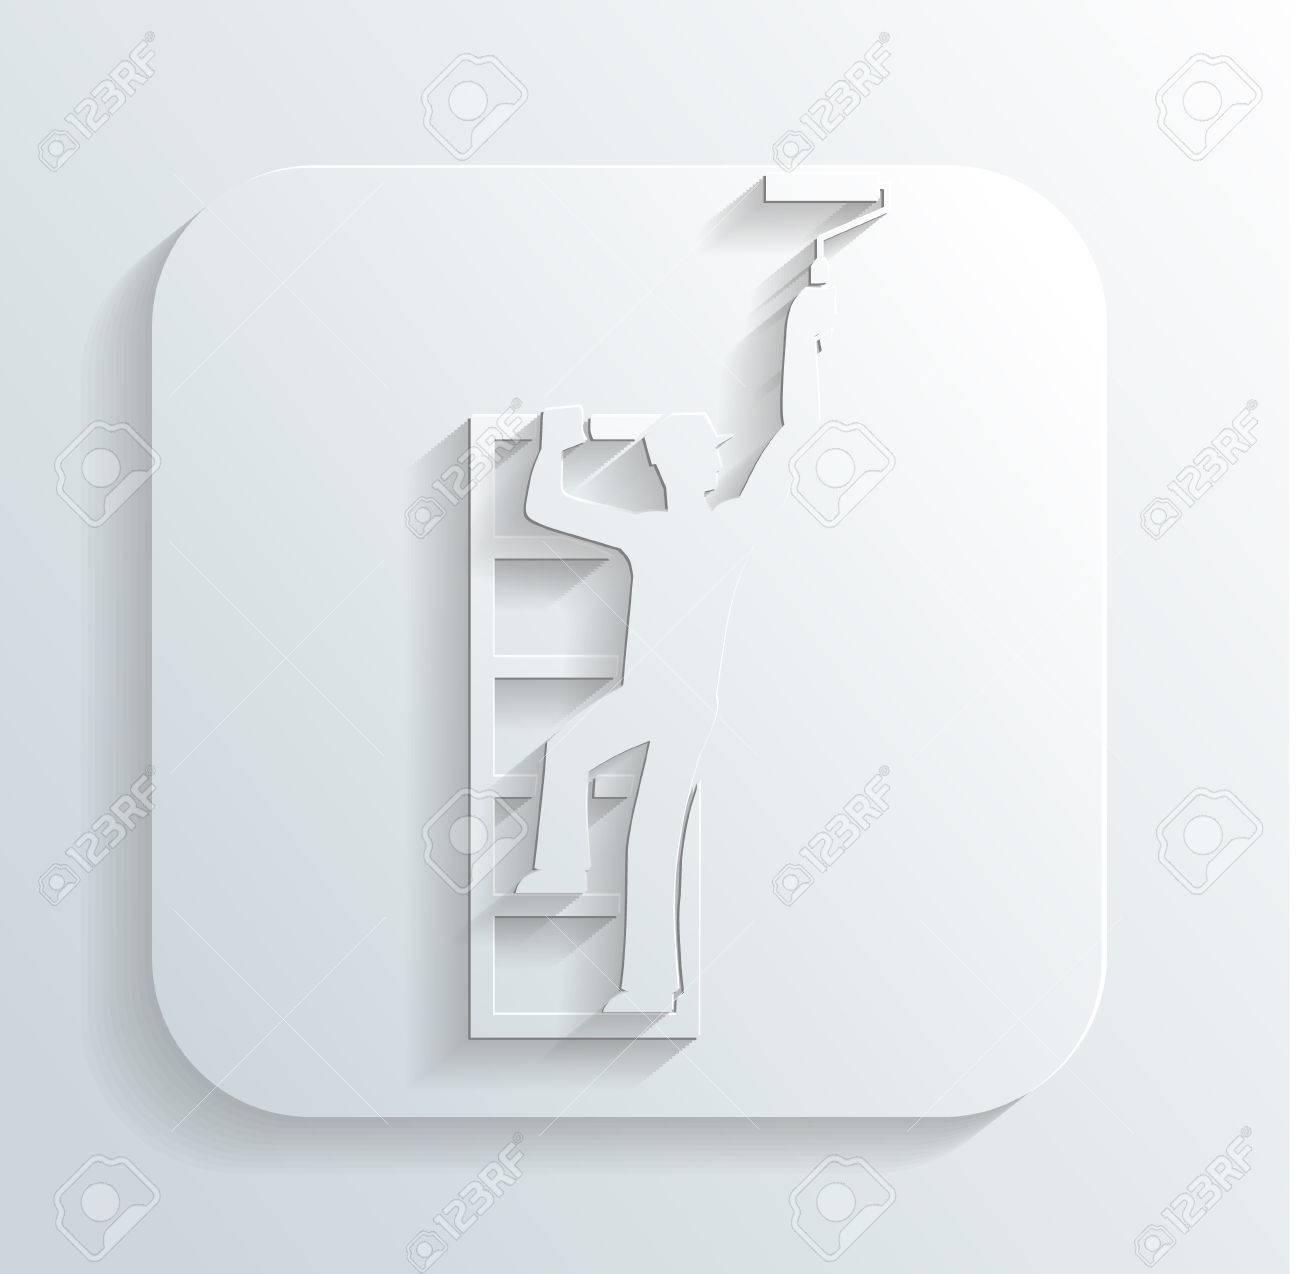 Painter icon Stock Vector - 22243818